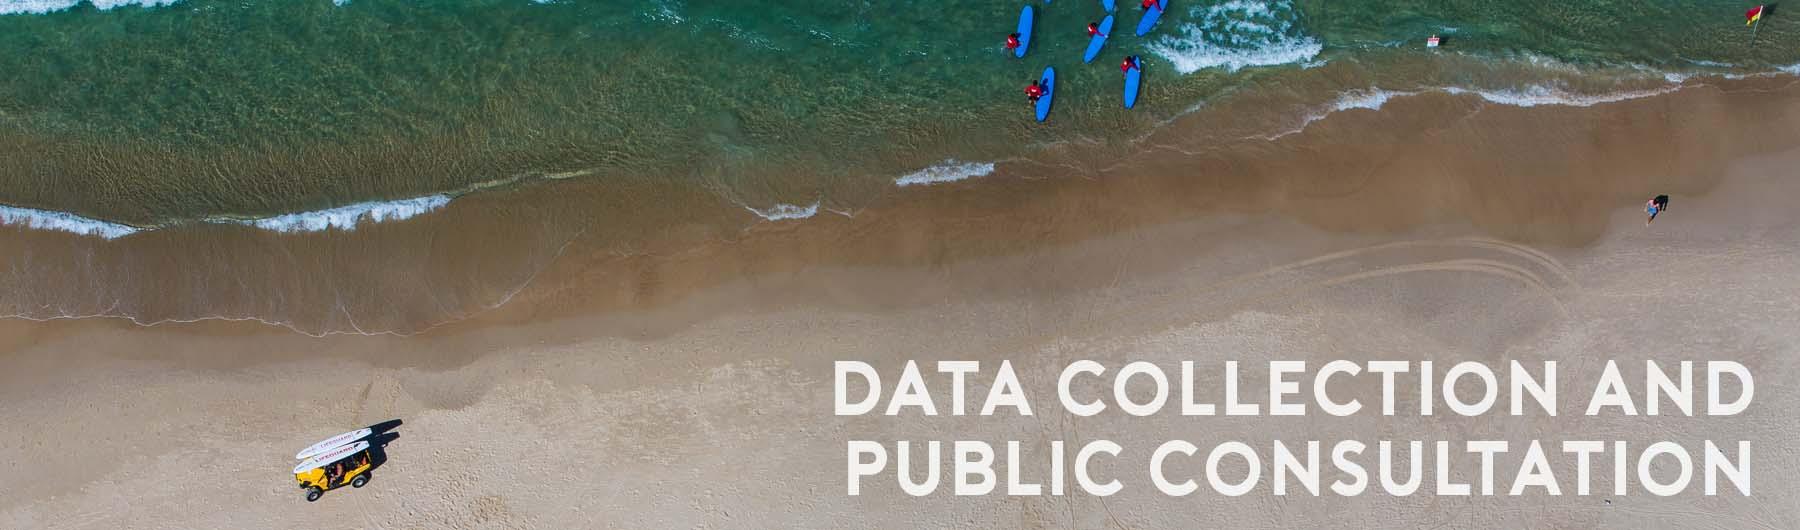 surf_break_research_data_slider_3